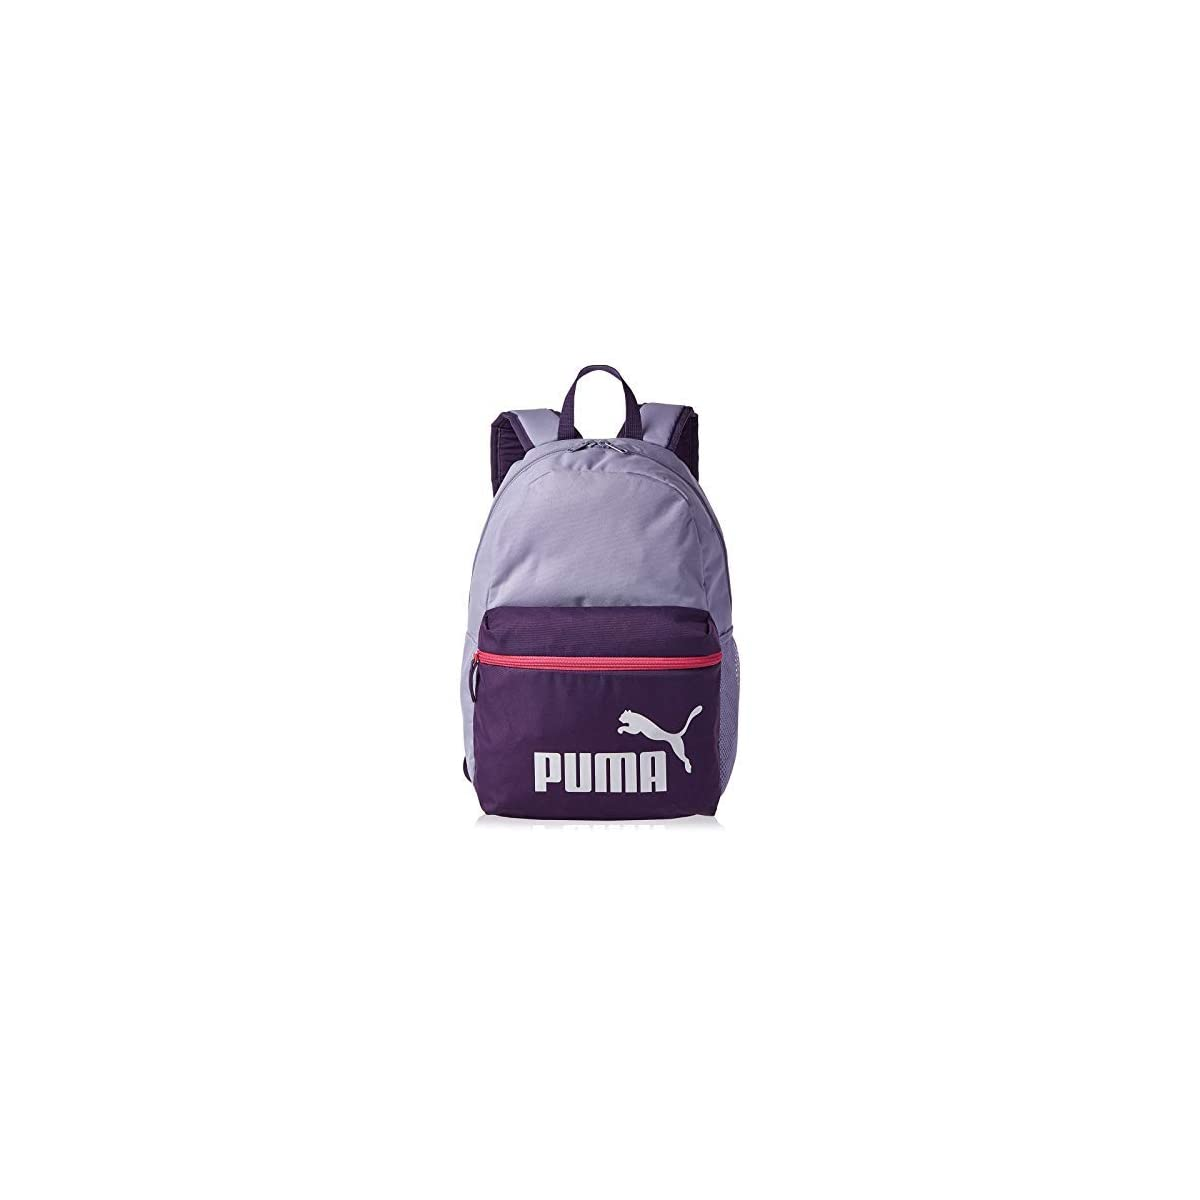 411gtOBrlYL. SS1200  - Puma Phase - Mochila, Unisex Adulto